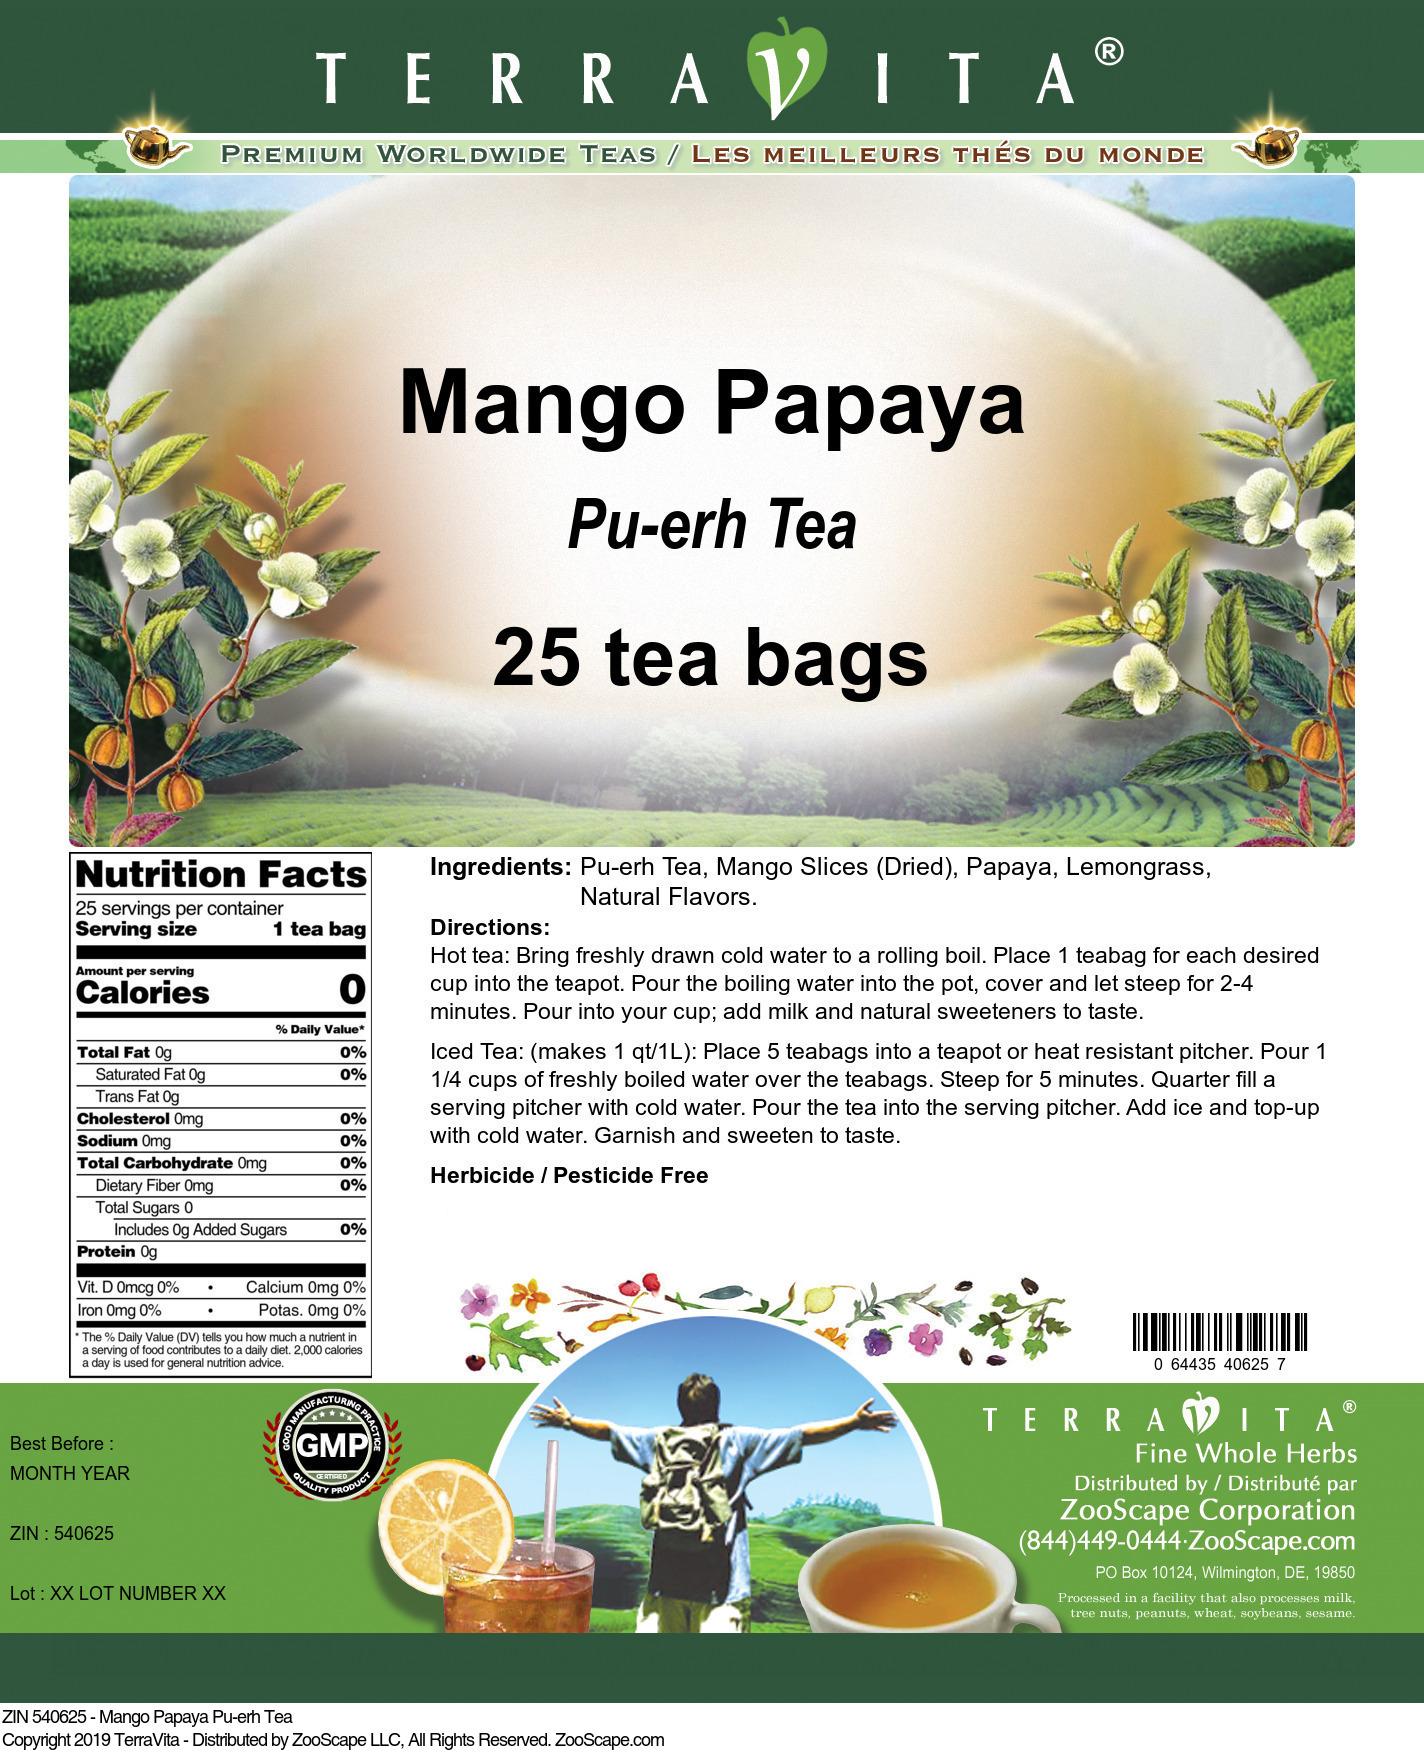 Mango Papaya Pu-erh Tea